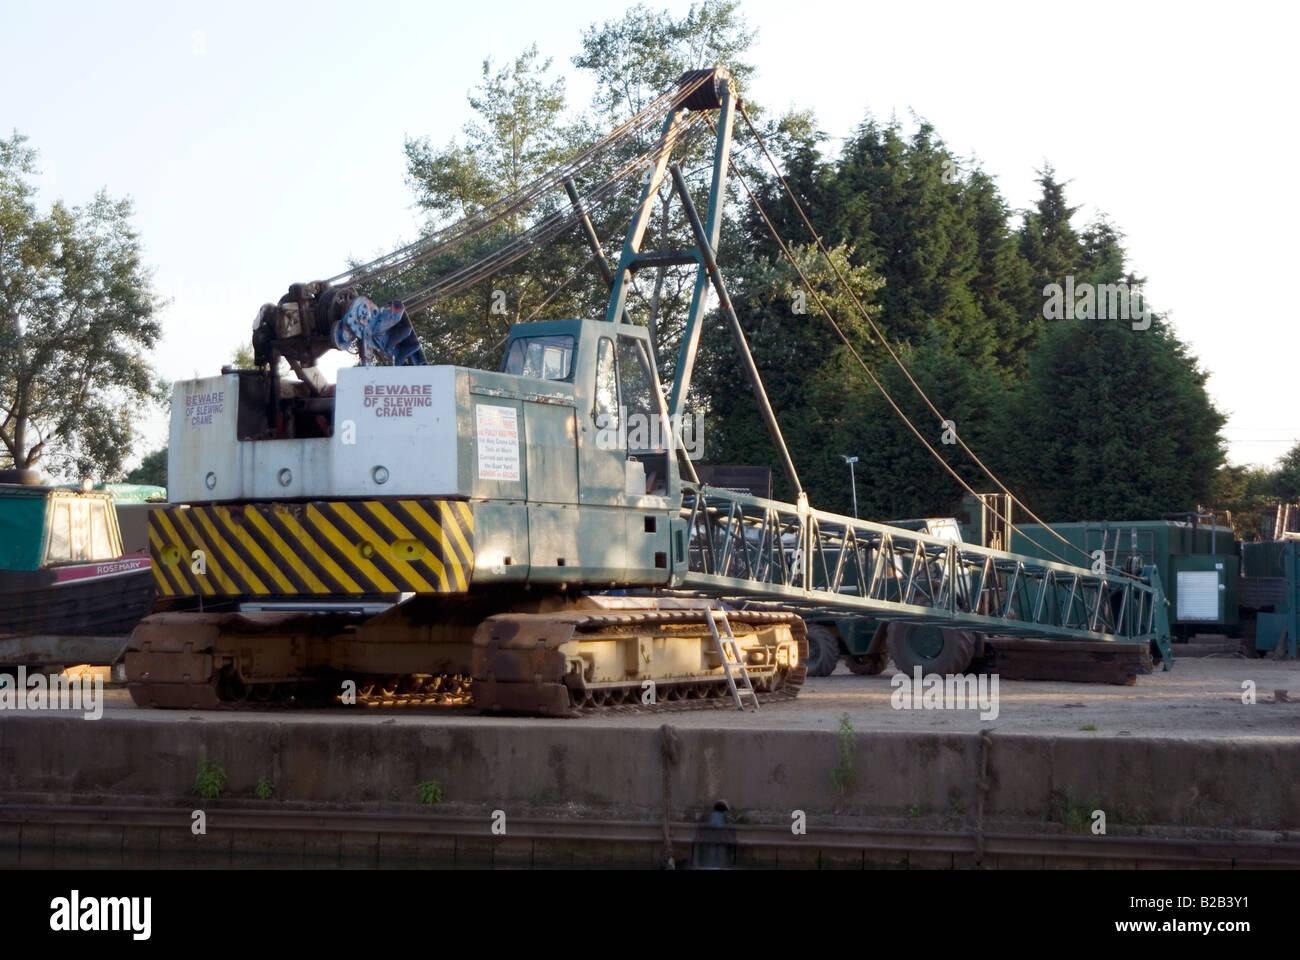 Crane accident on 23 July 2008 at Willowbridge Marina Stoke Road Bletchley Milton Keynes MK2 3JZ on the Grand Union Stock Photo